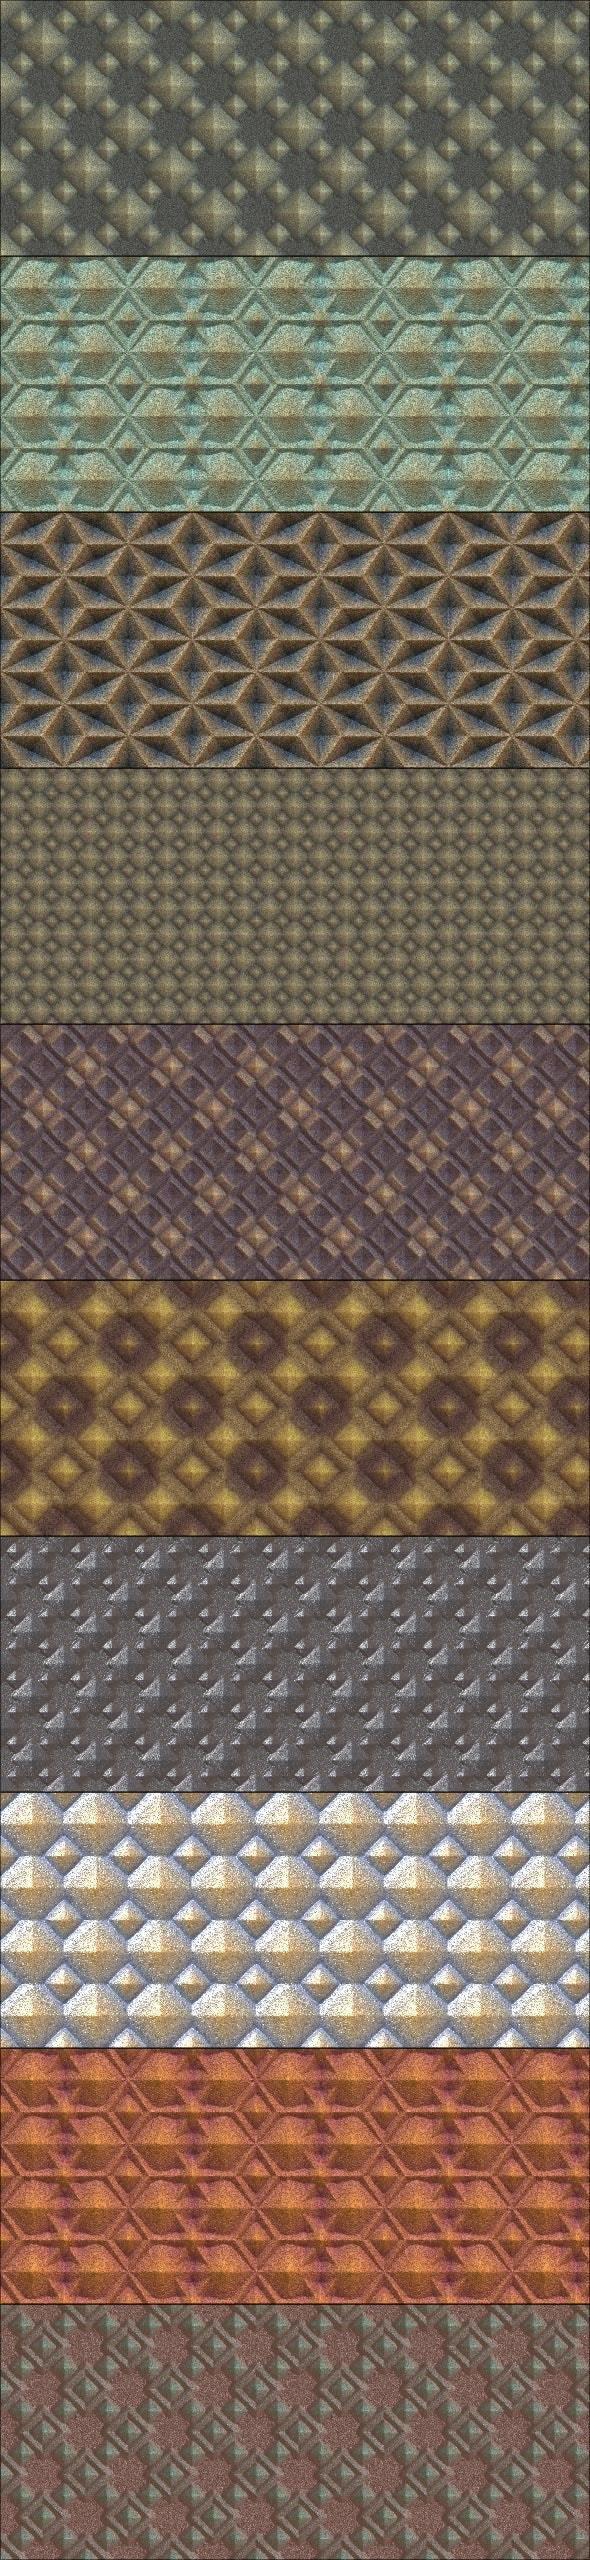 Diamond Panels - Urban Textures / Fills / Patterns